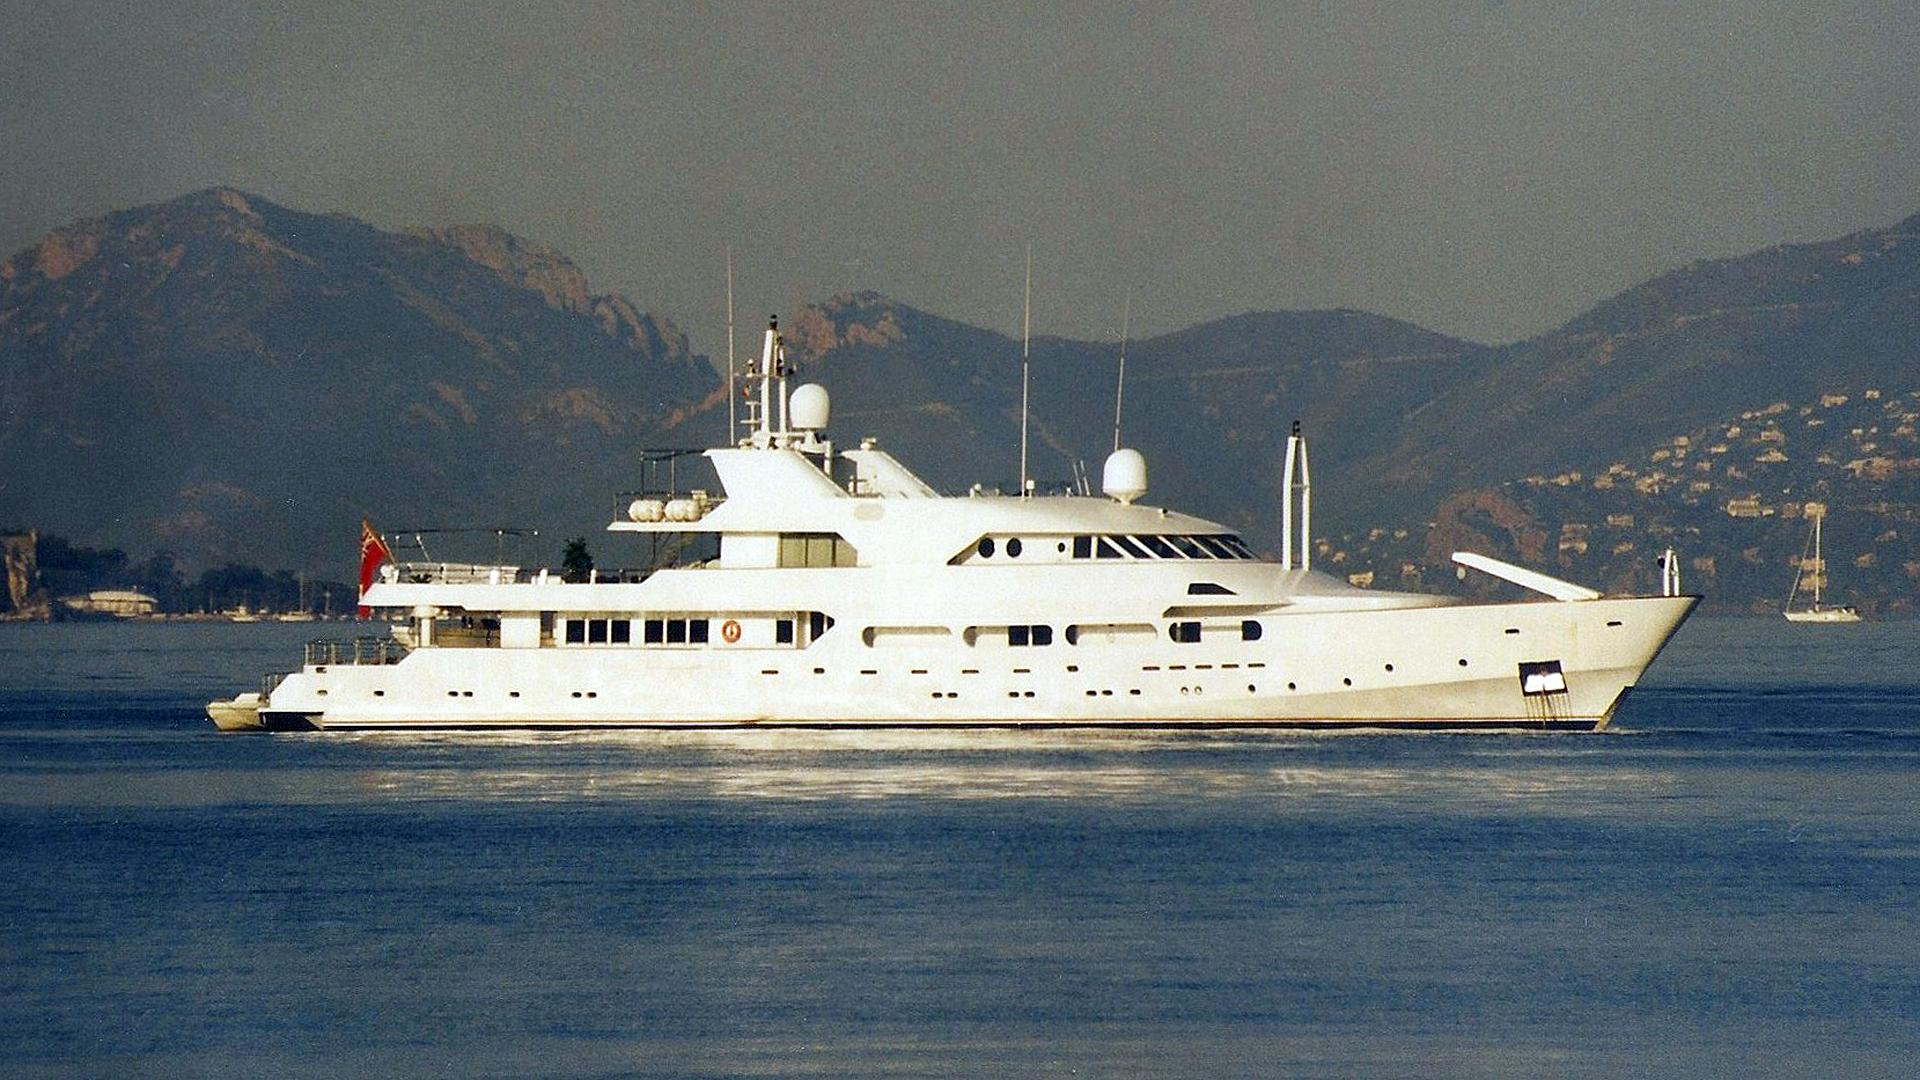 achilles-motor-yacht-crn-1984-55m-profile